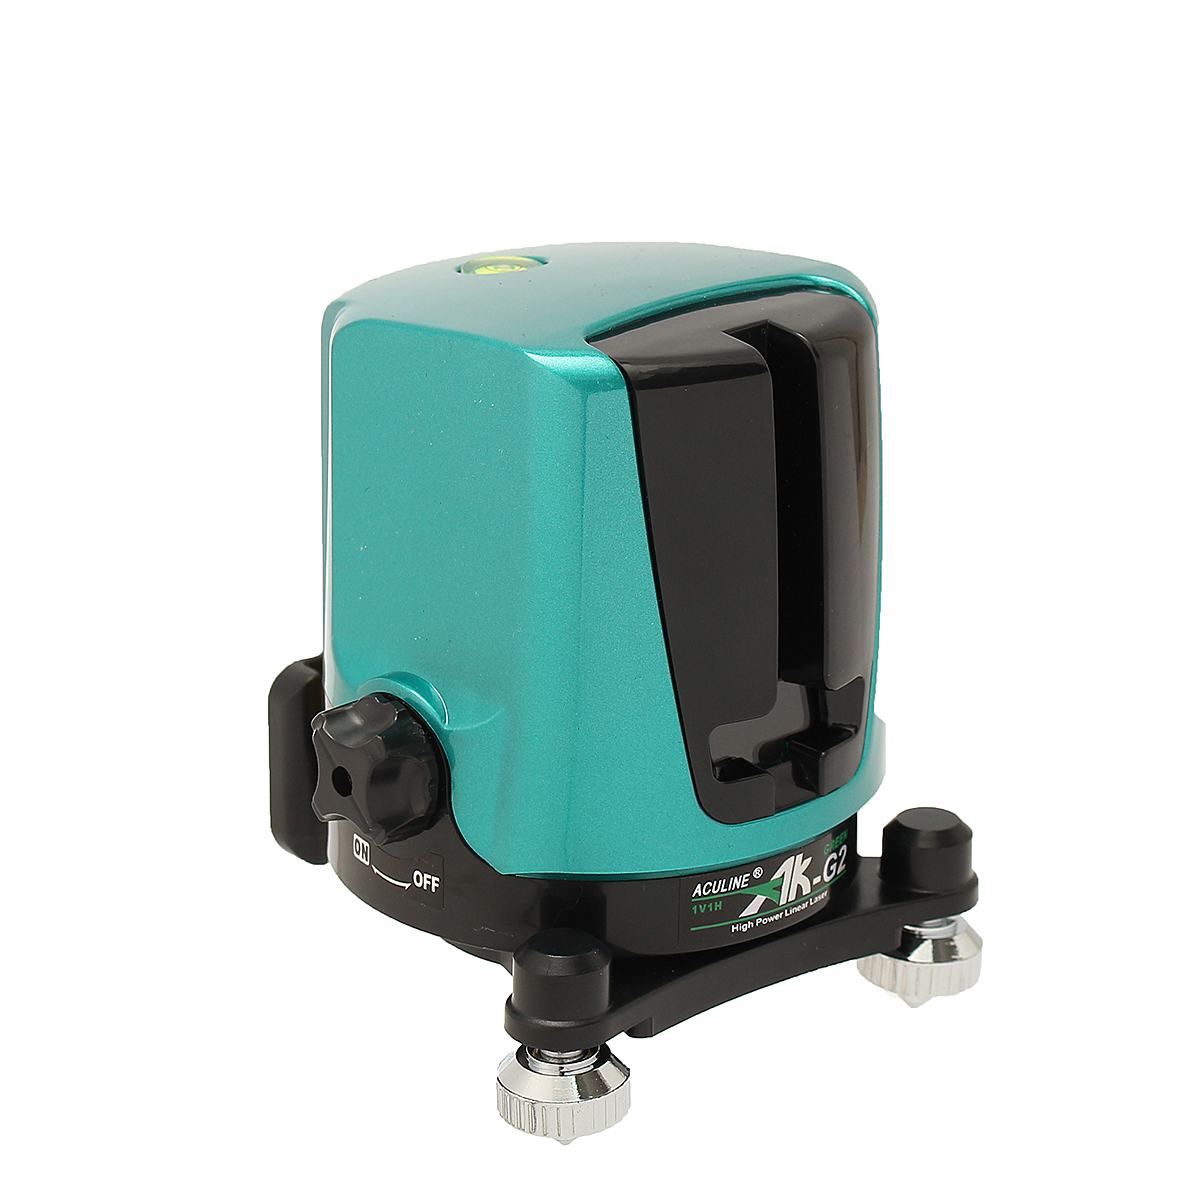 цена 2 Lines Green Beam Line 360 Degree 3D Laser Level Self Levelling Horizontal and Vertical Cross-Line Mini Laser Measurement Tool